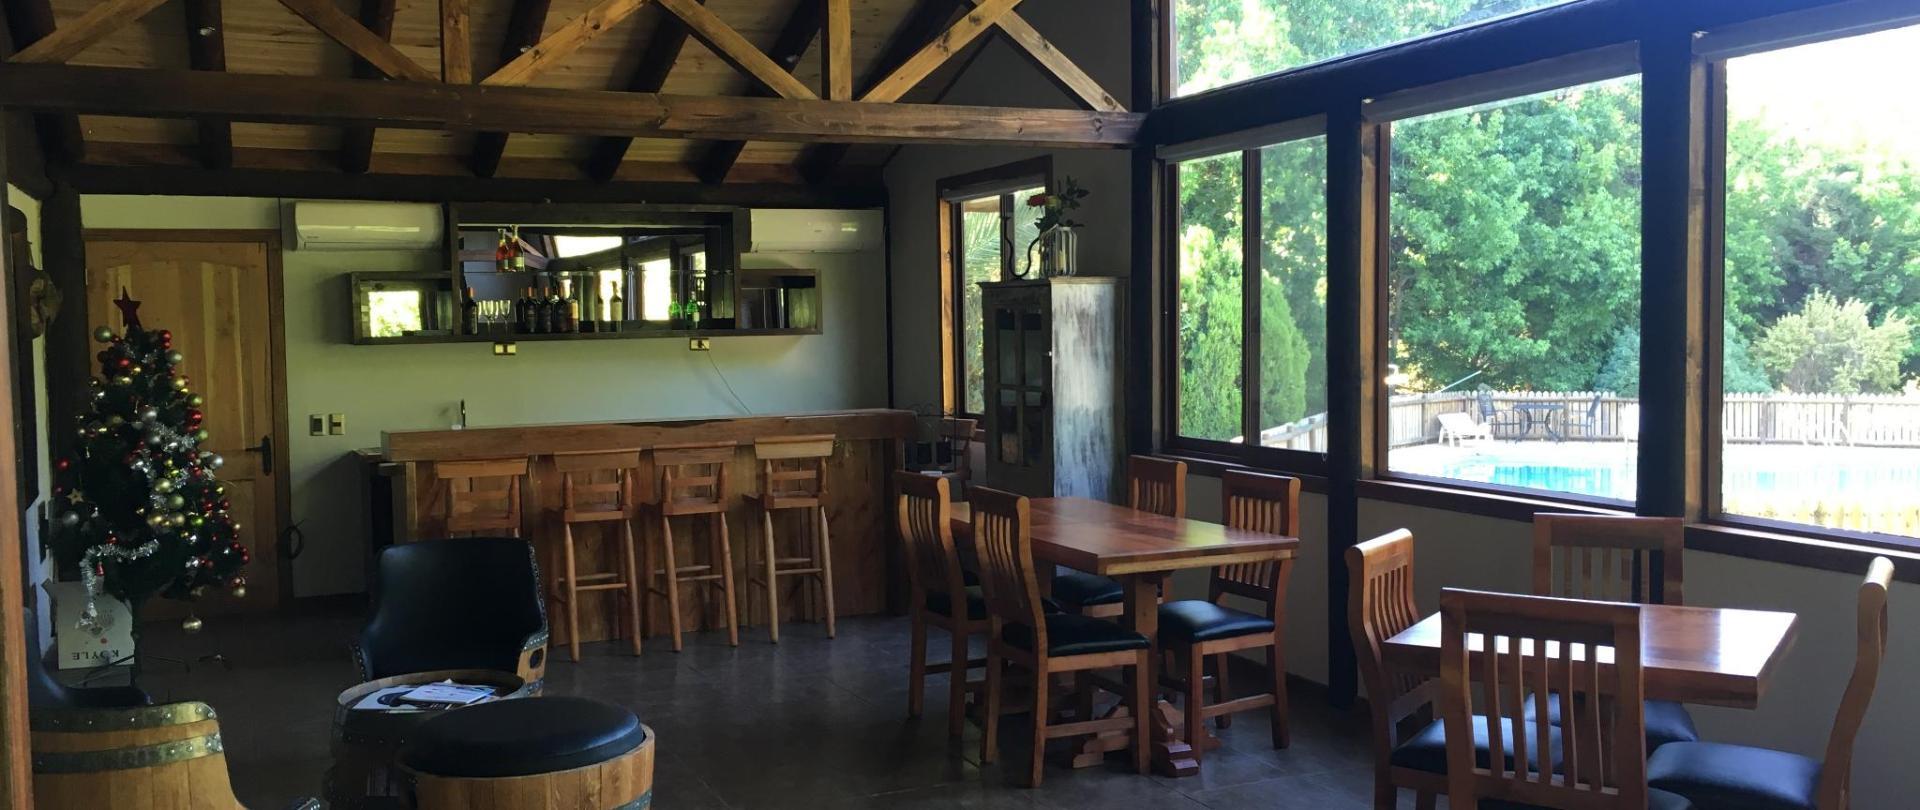 dining room lodge copy.JPG